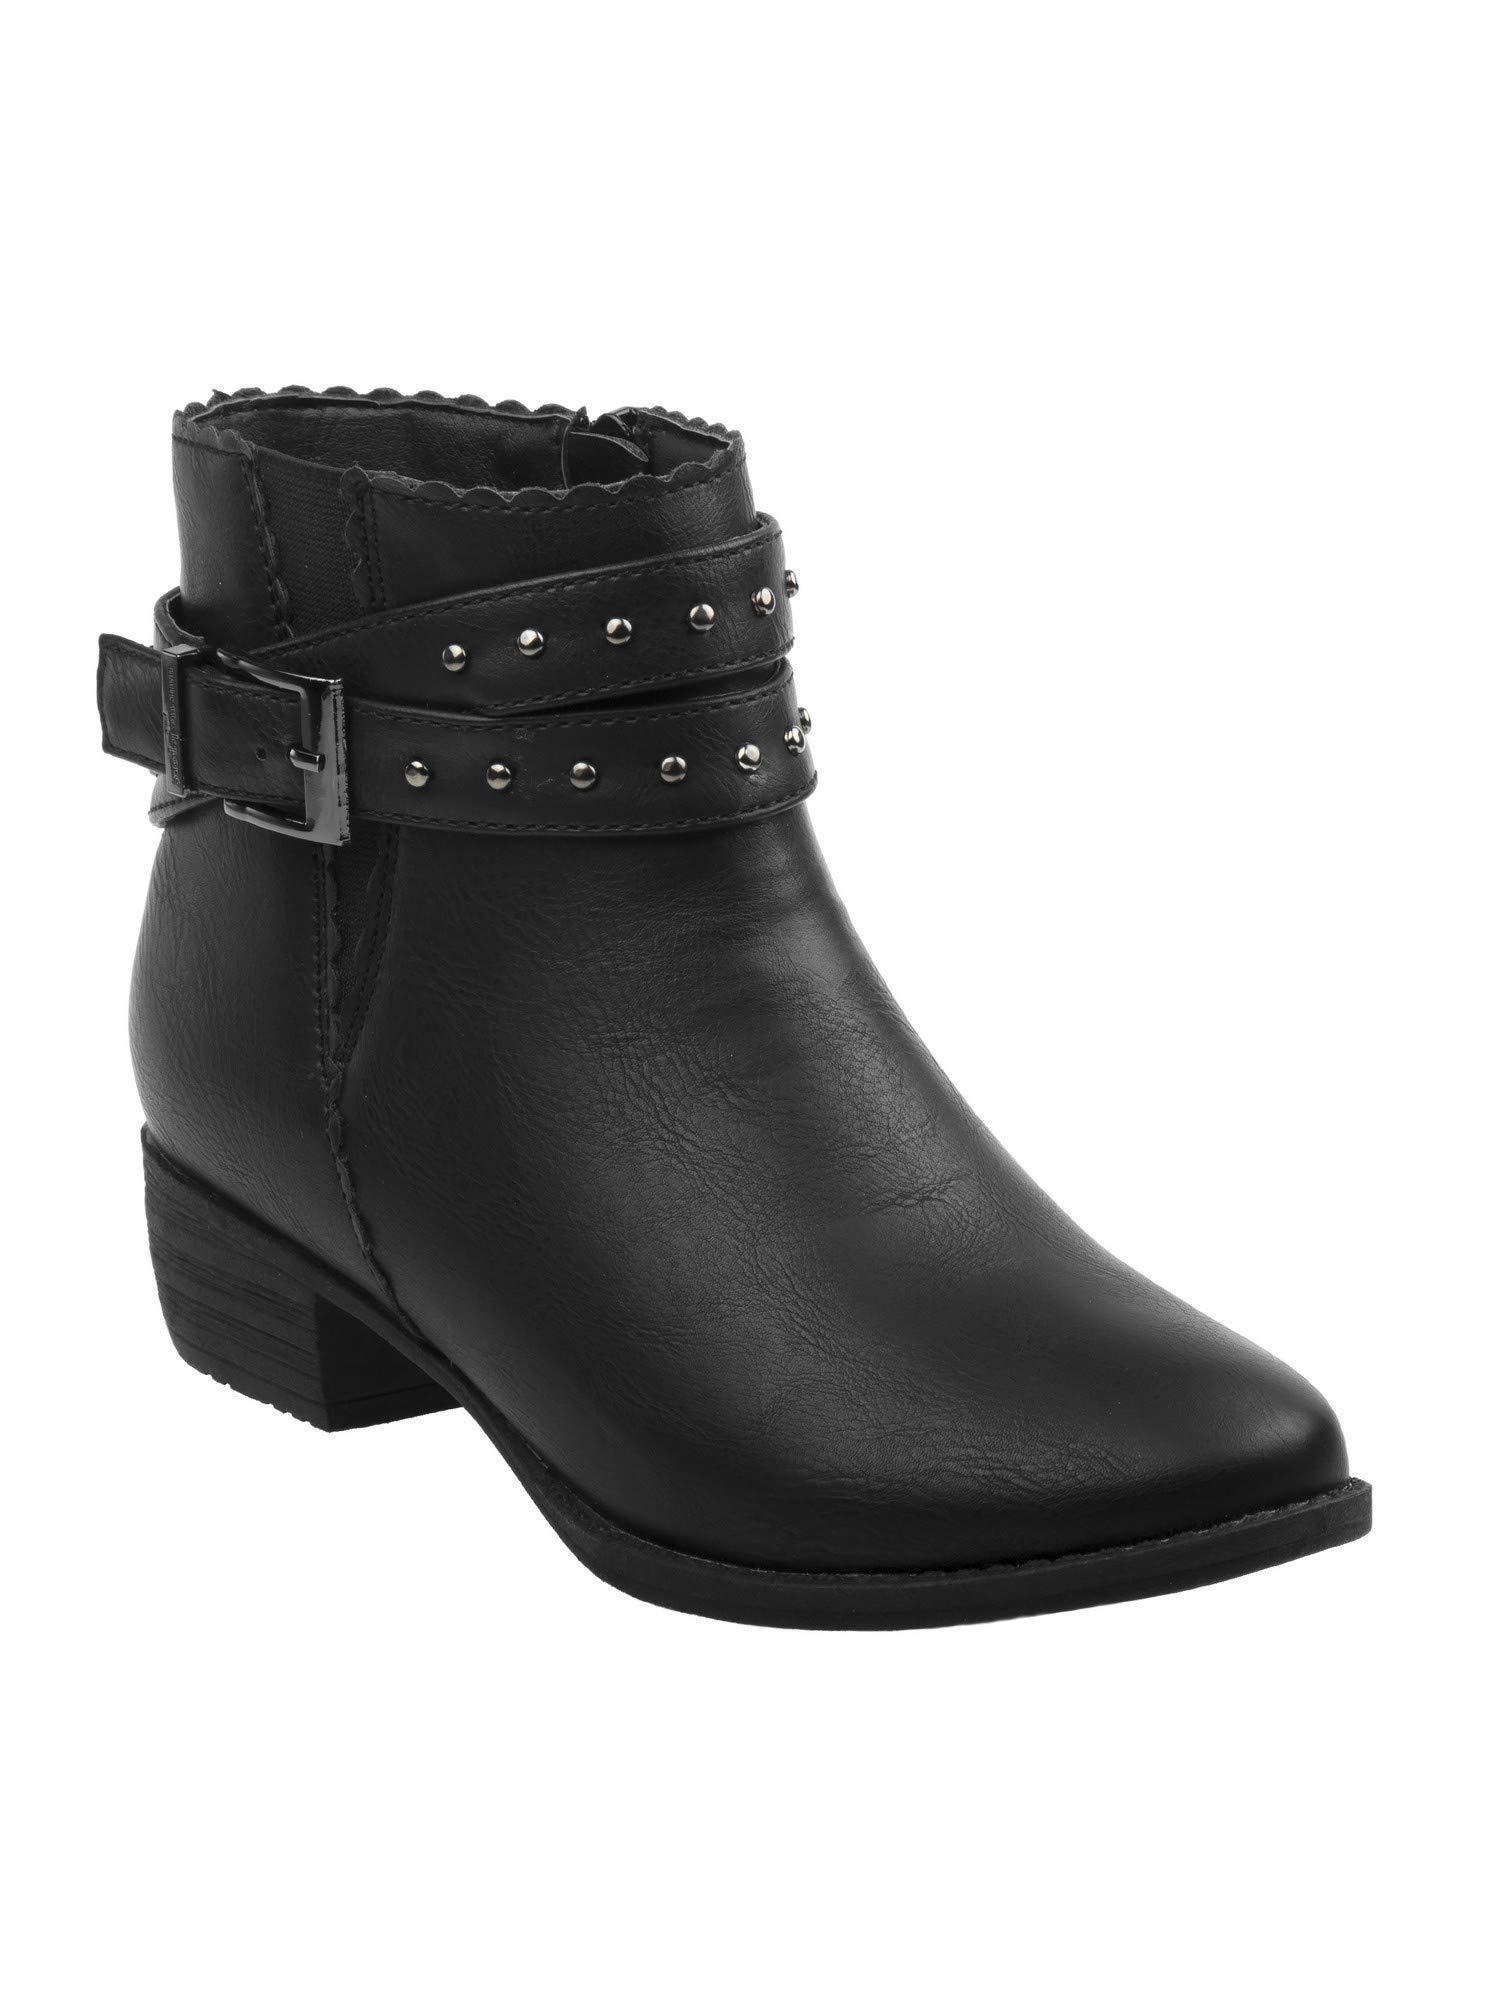 Nanette Lepore Girls Black Studded Buckled Straps Ankle Booties 12 Kids